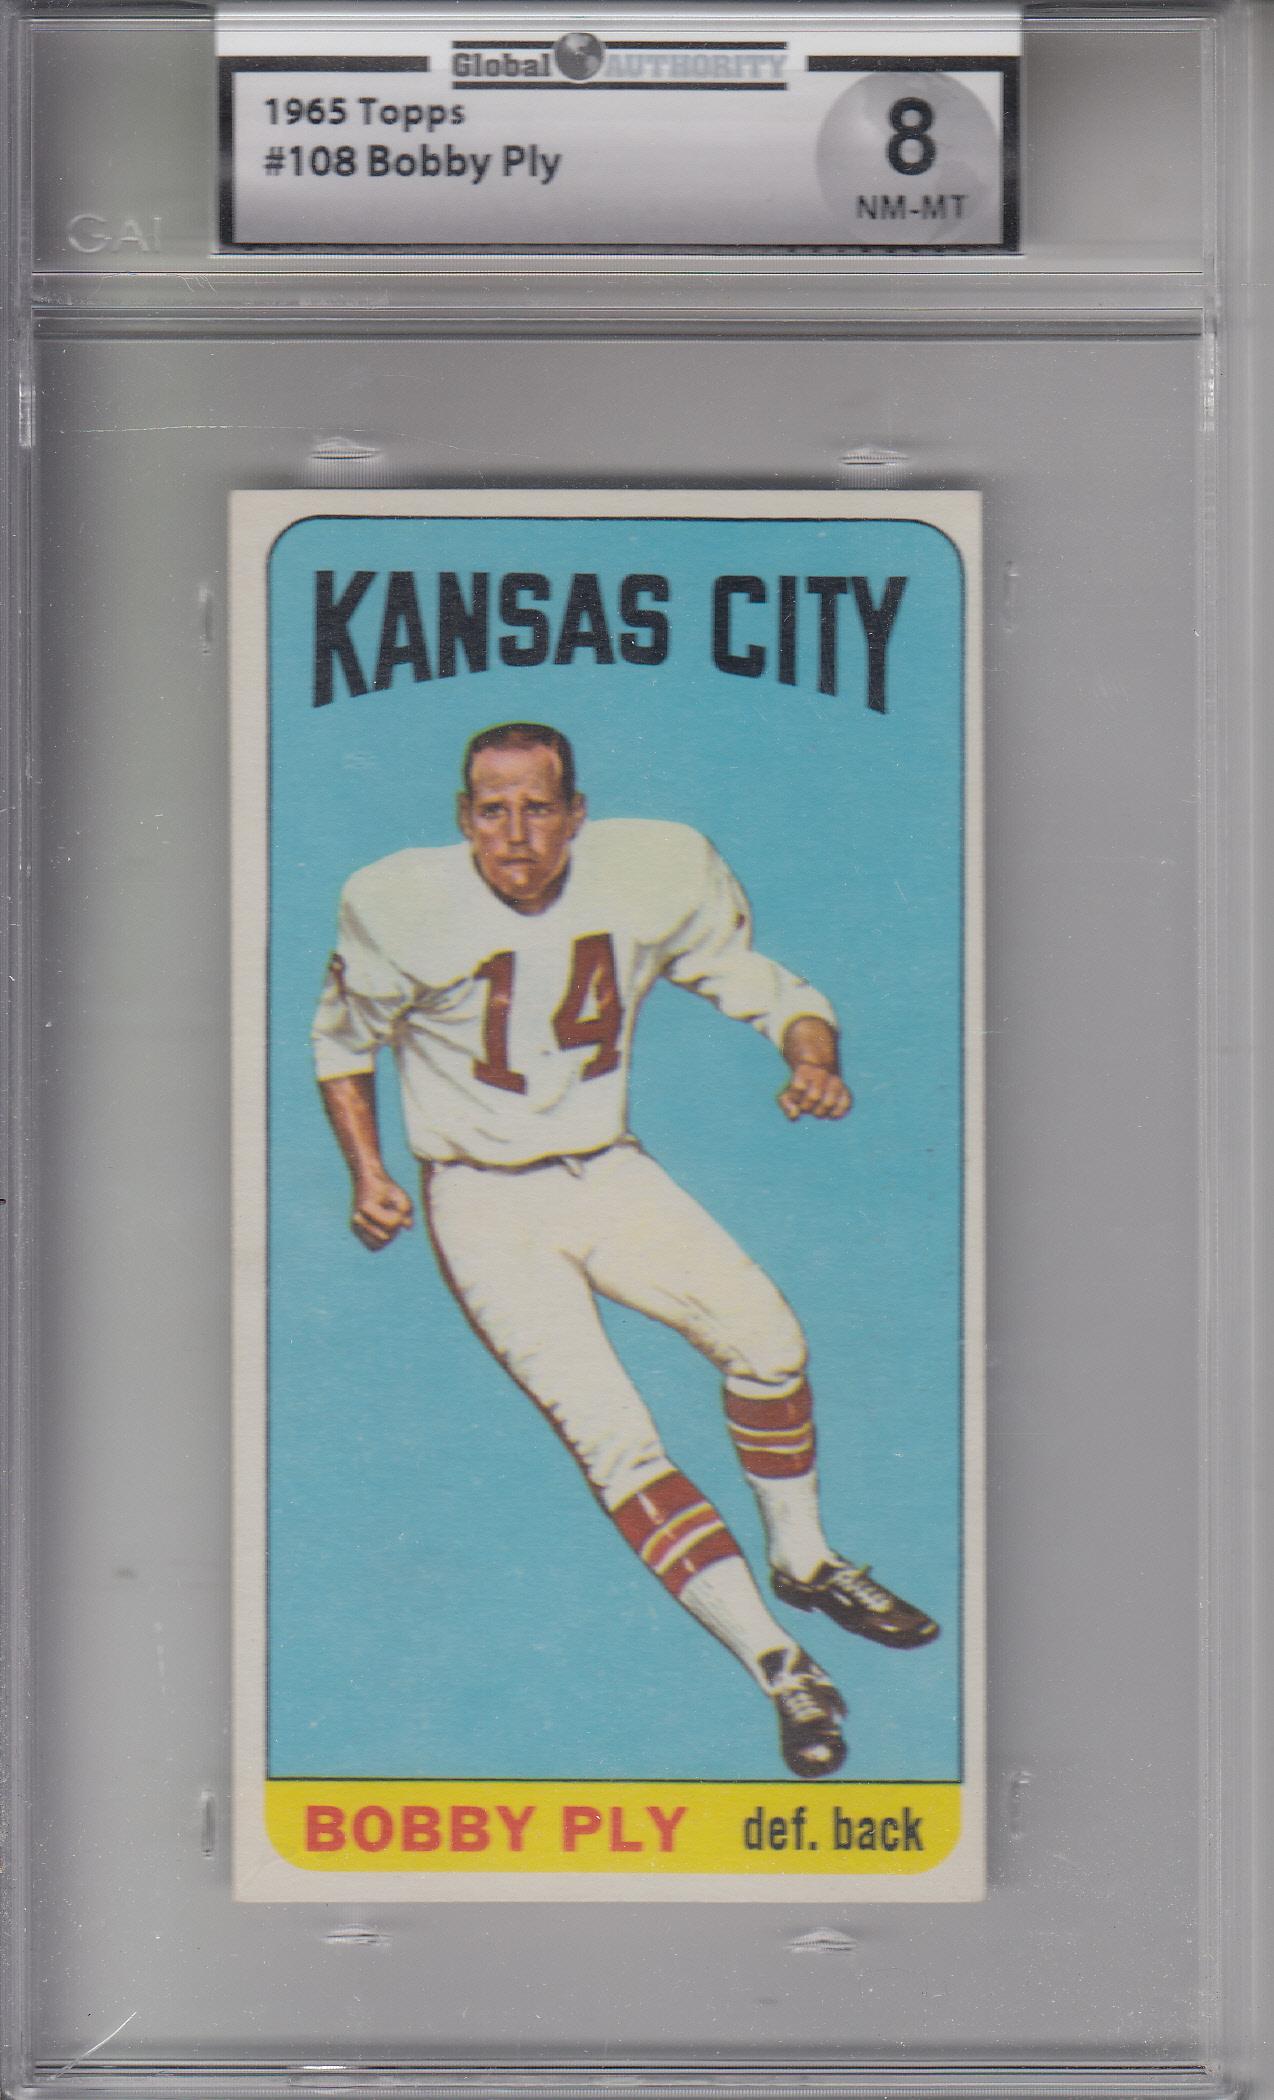 1965 Topps #108 Bobby Ply CHIEFS GAI 8 NM-MT Z20771